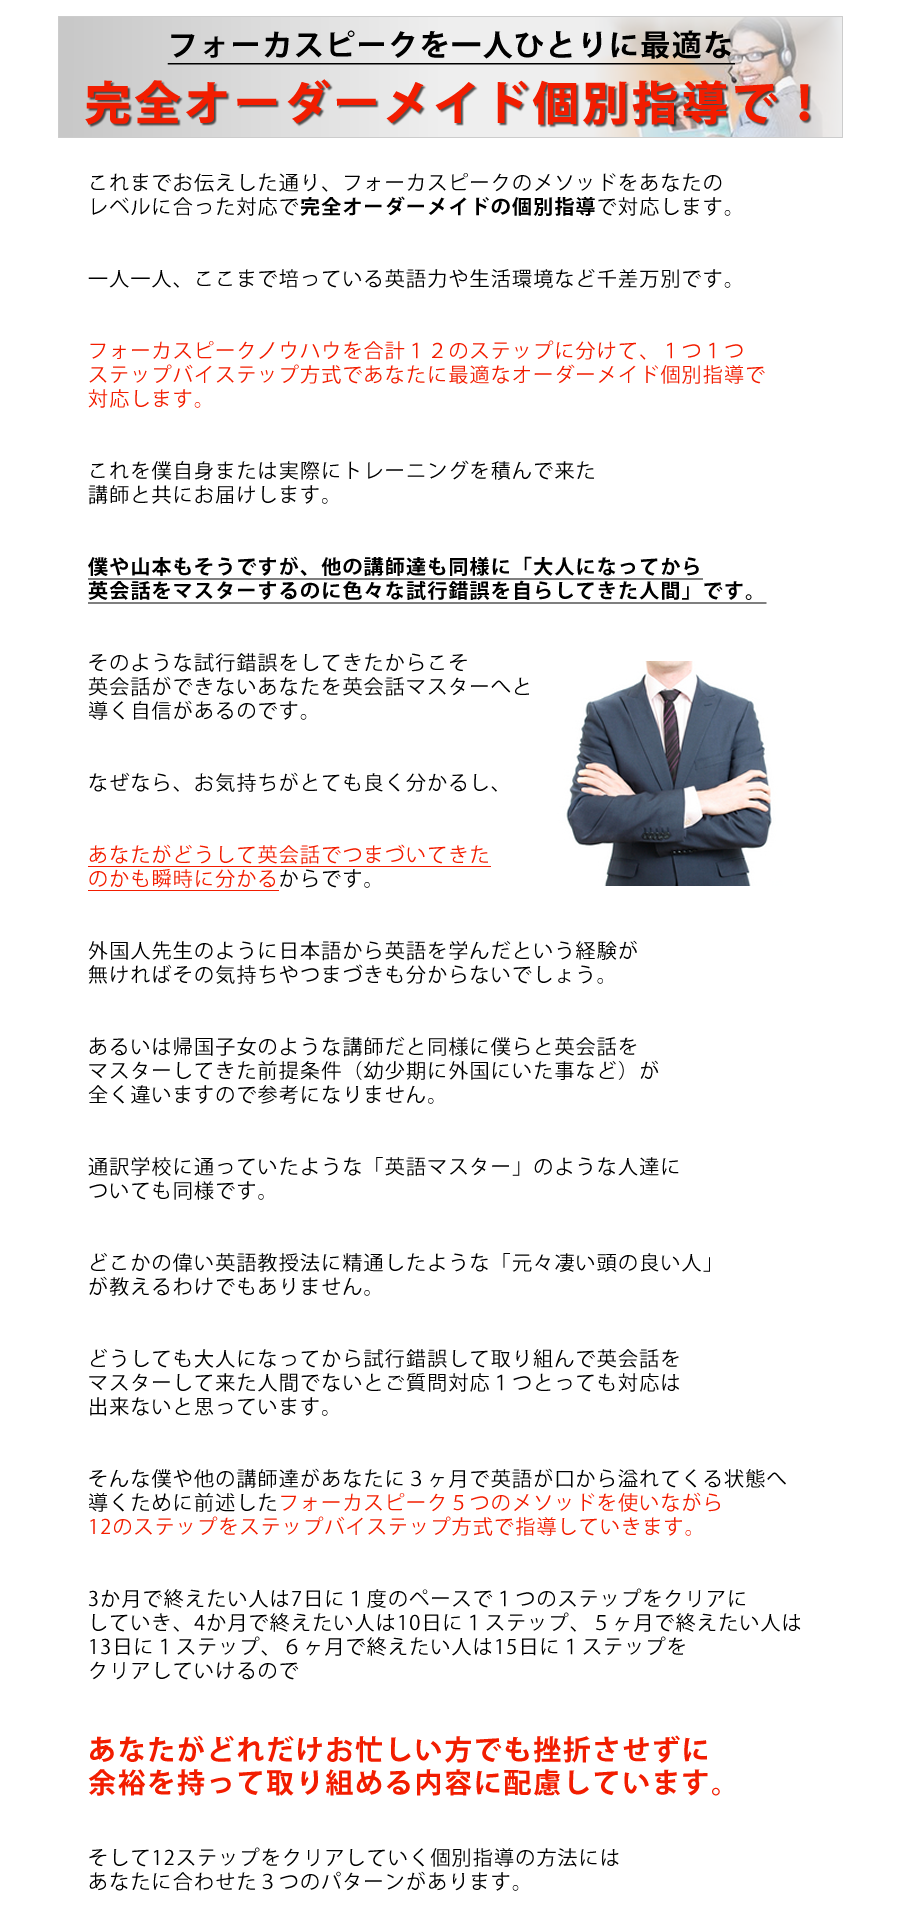 fs-message-11